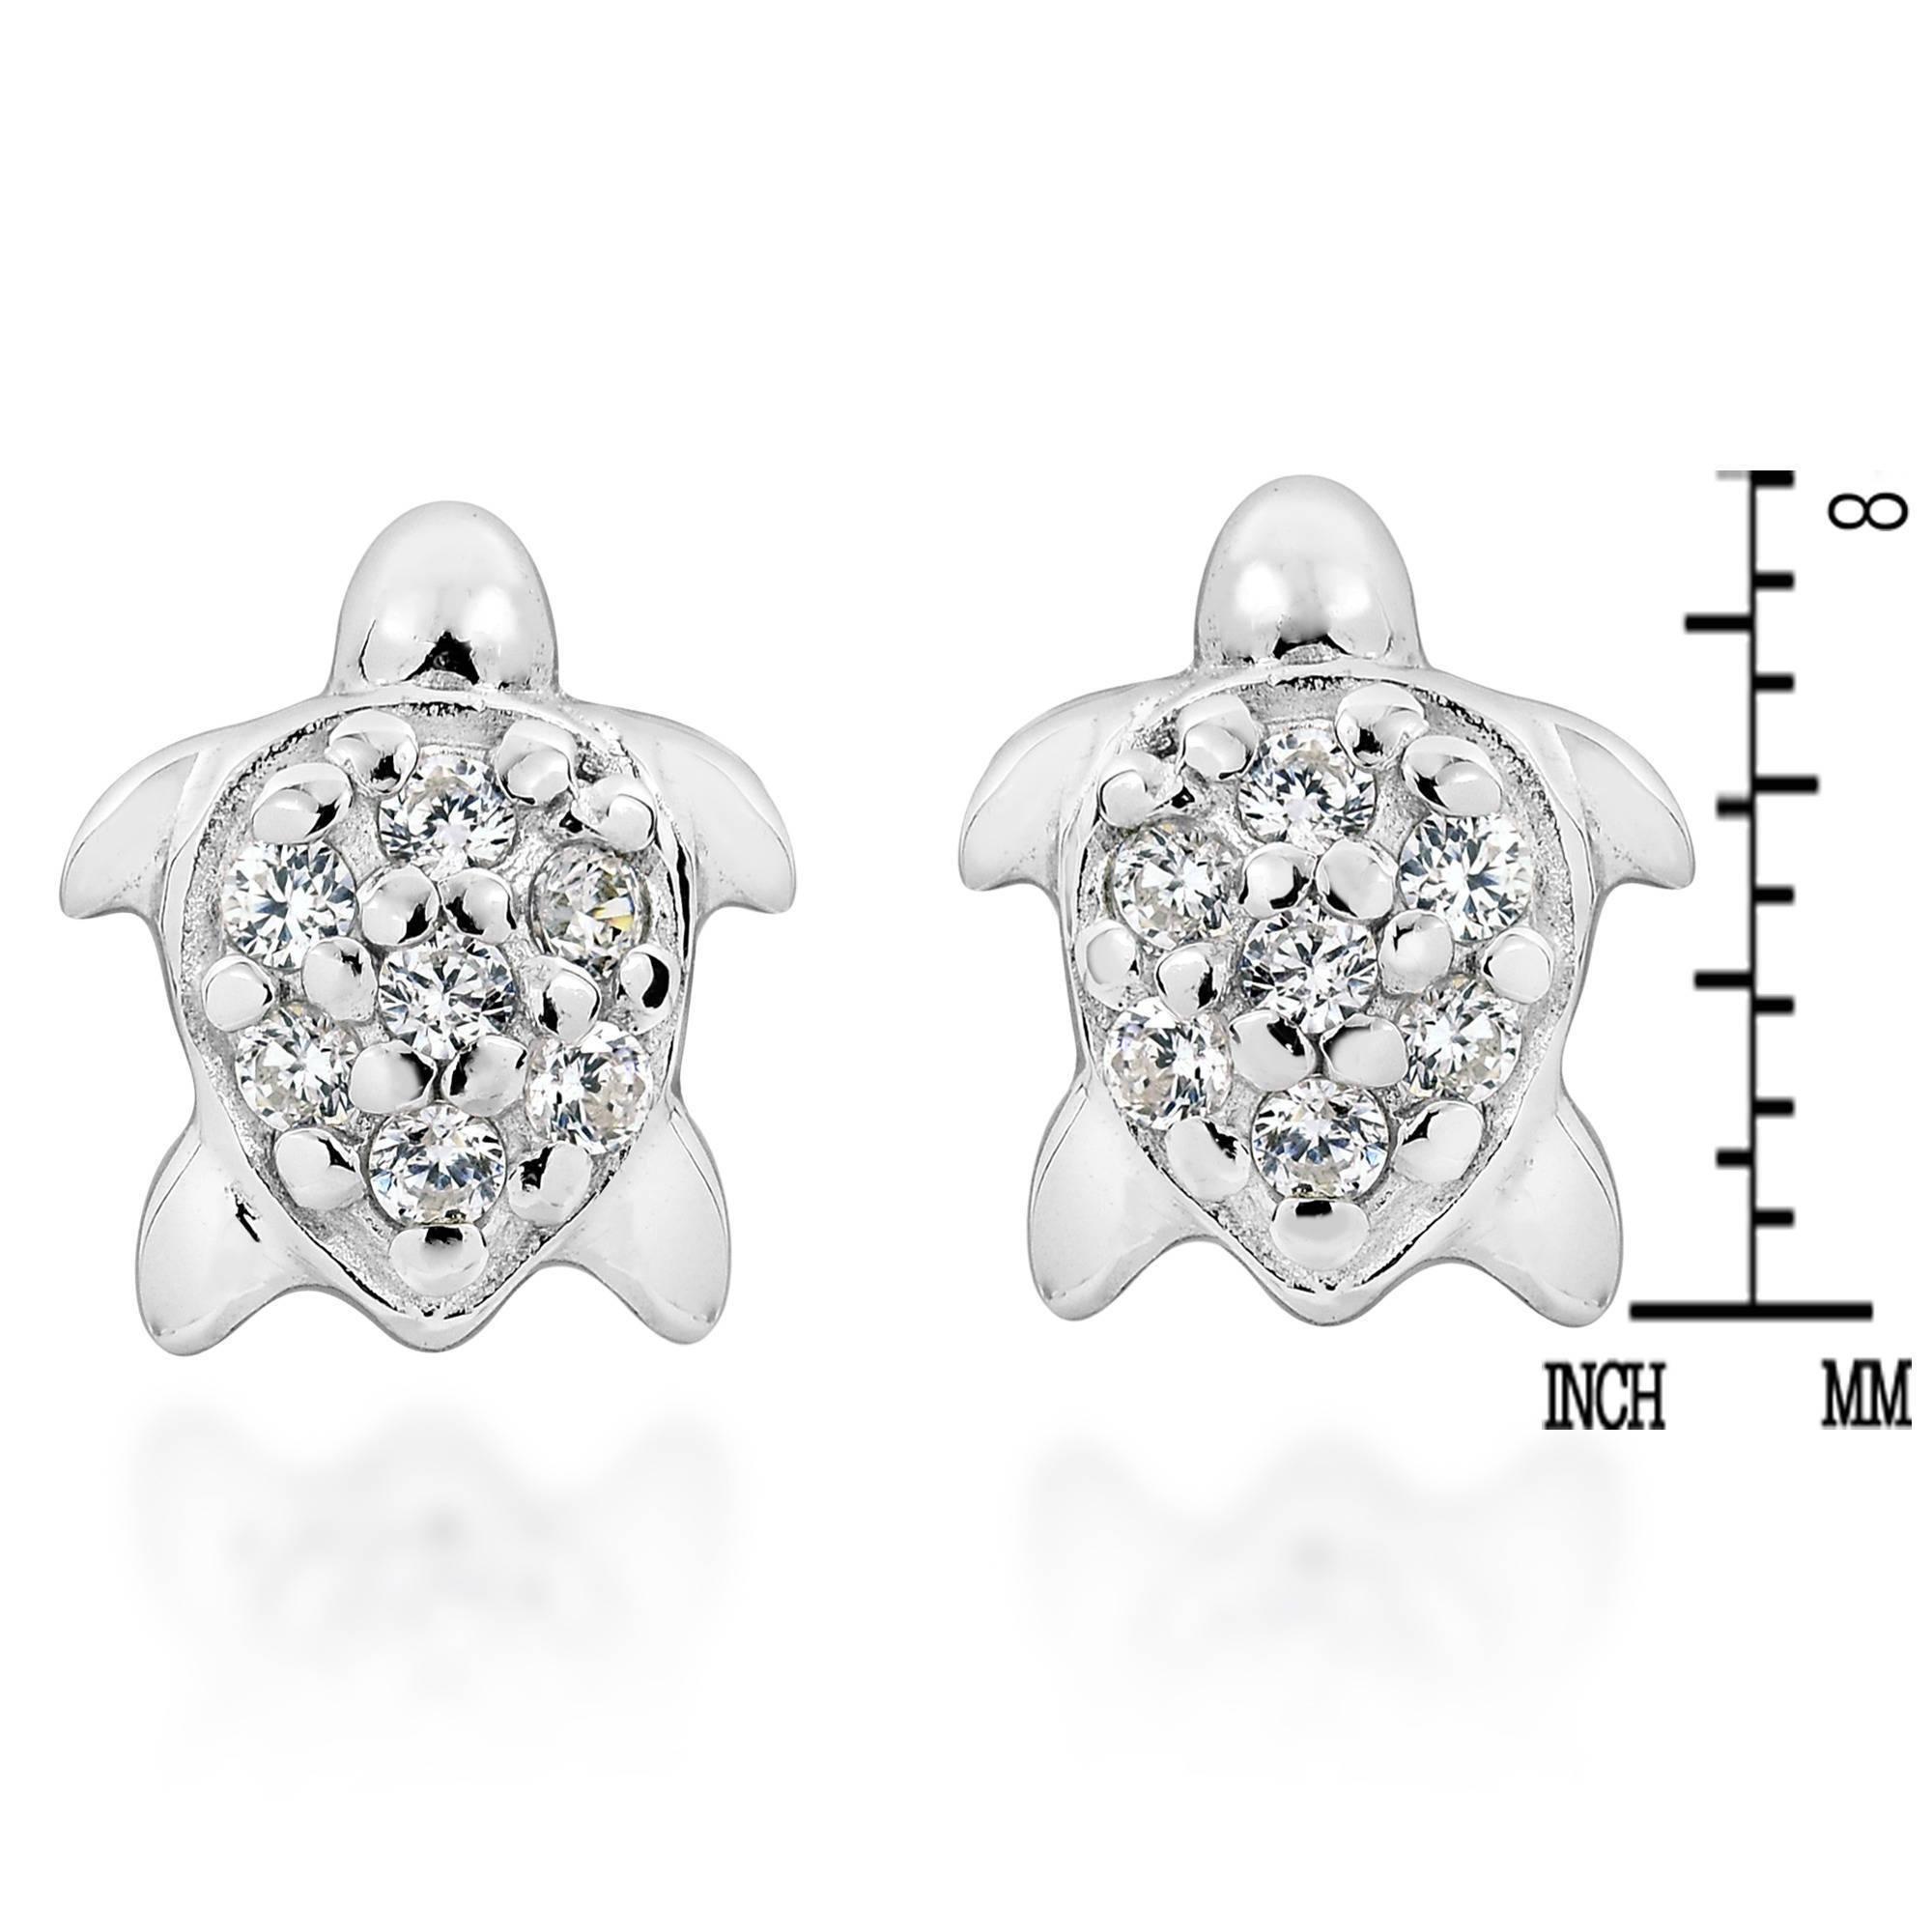 Mini Sea Turtle Cubic Zirconia Adorned .925 Sterling Silver Stud Earrings